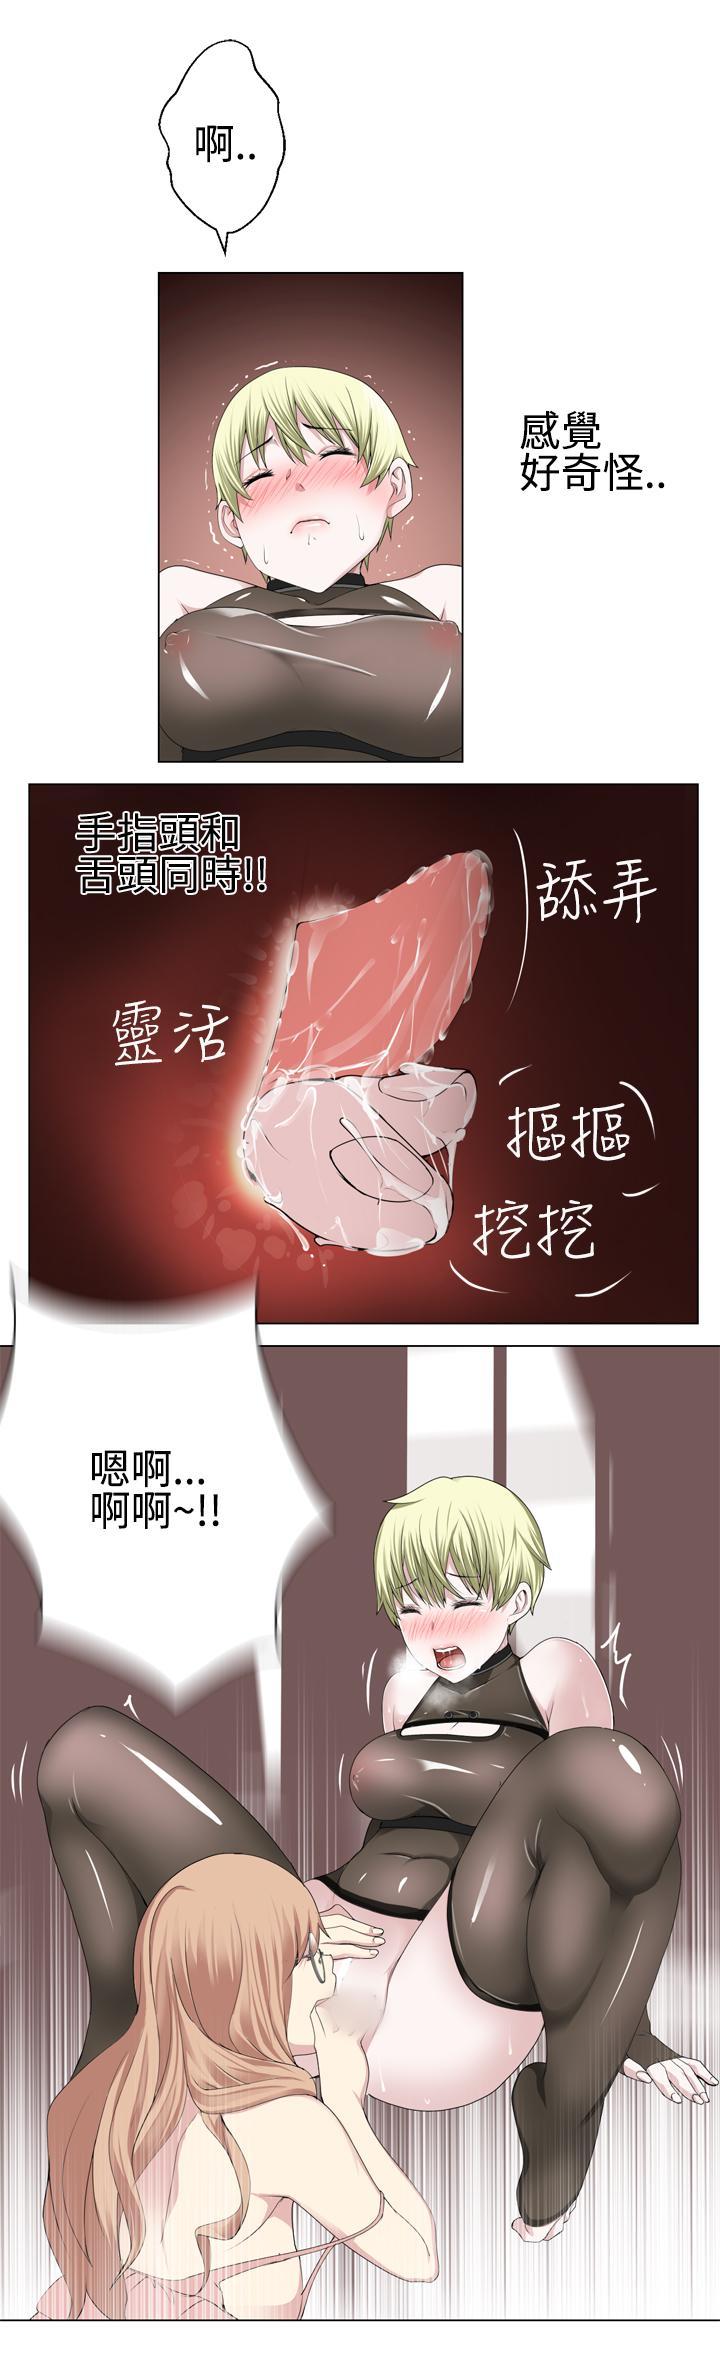 [SOSO] Franken Jo 为爱而生 法兰克赵 Ch.1~19 [Chinese]中文 347